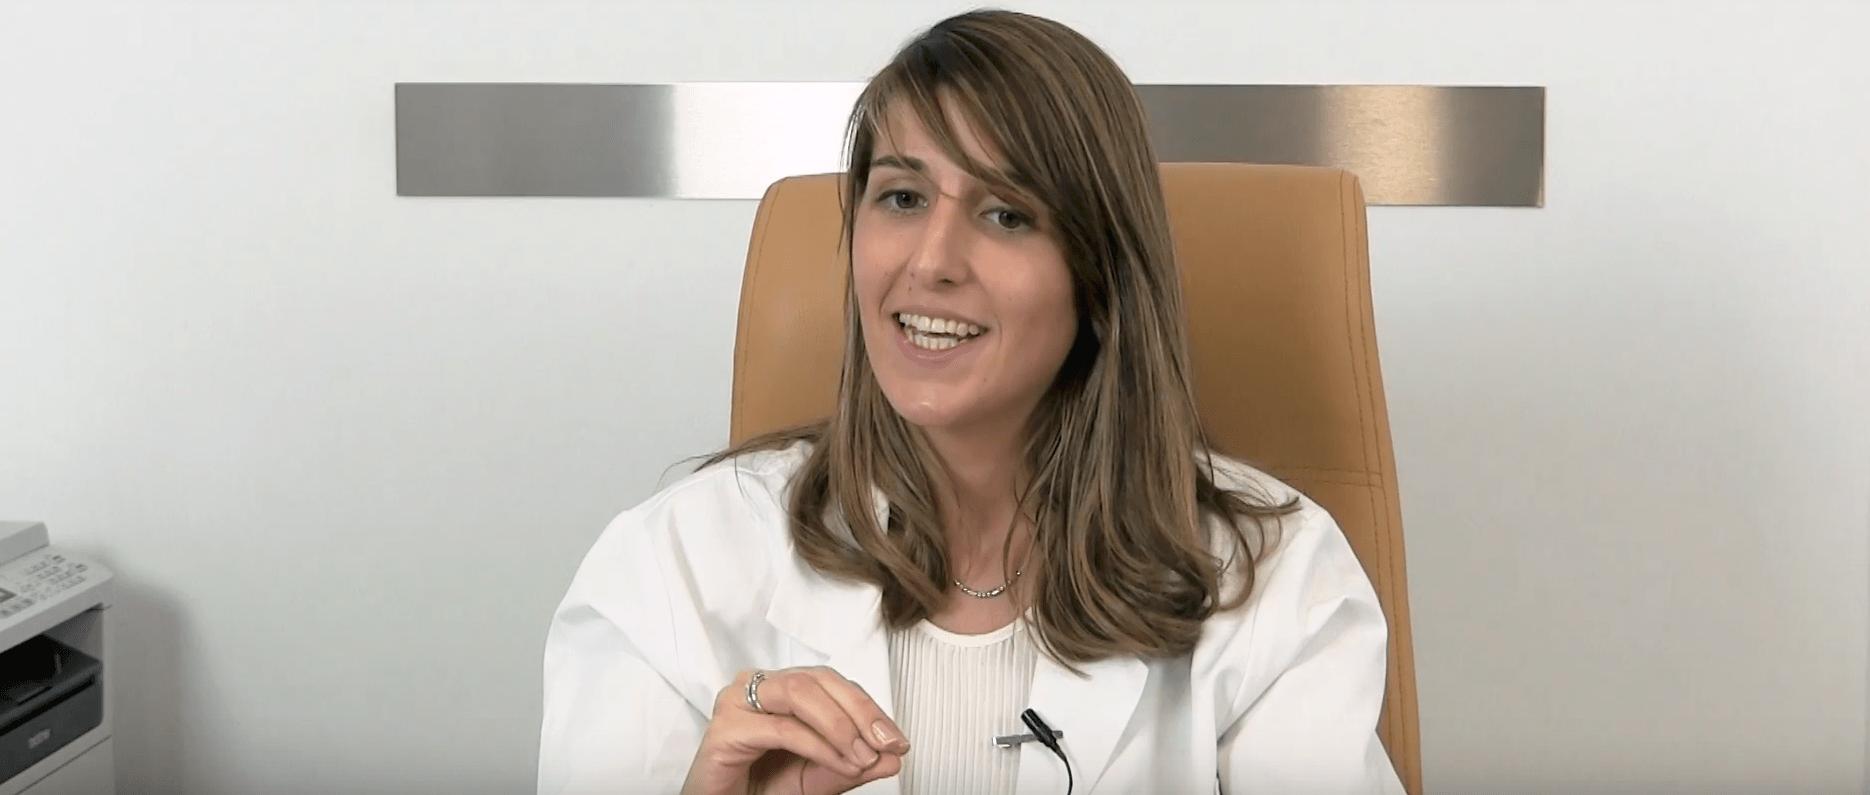 Blanca Paraíso, MD, PhD, MSc